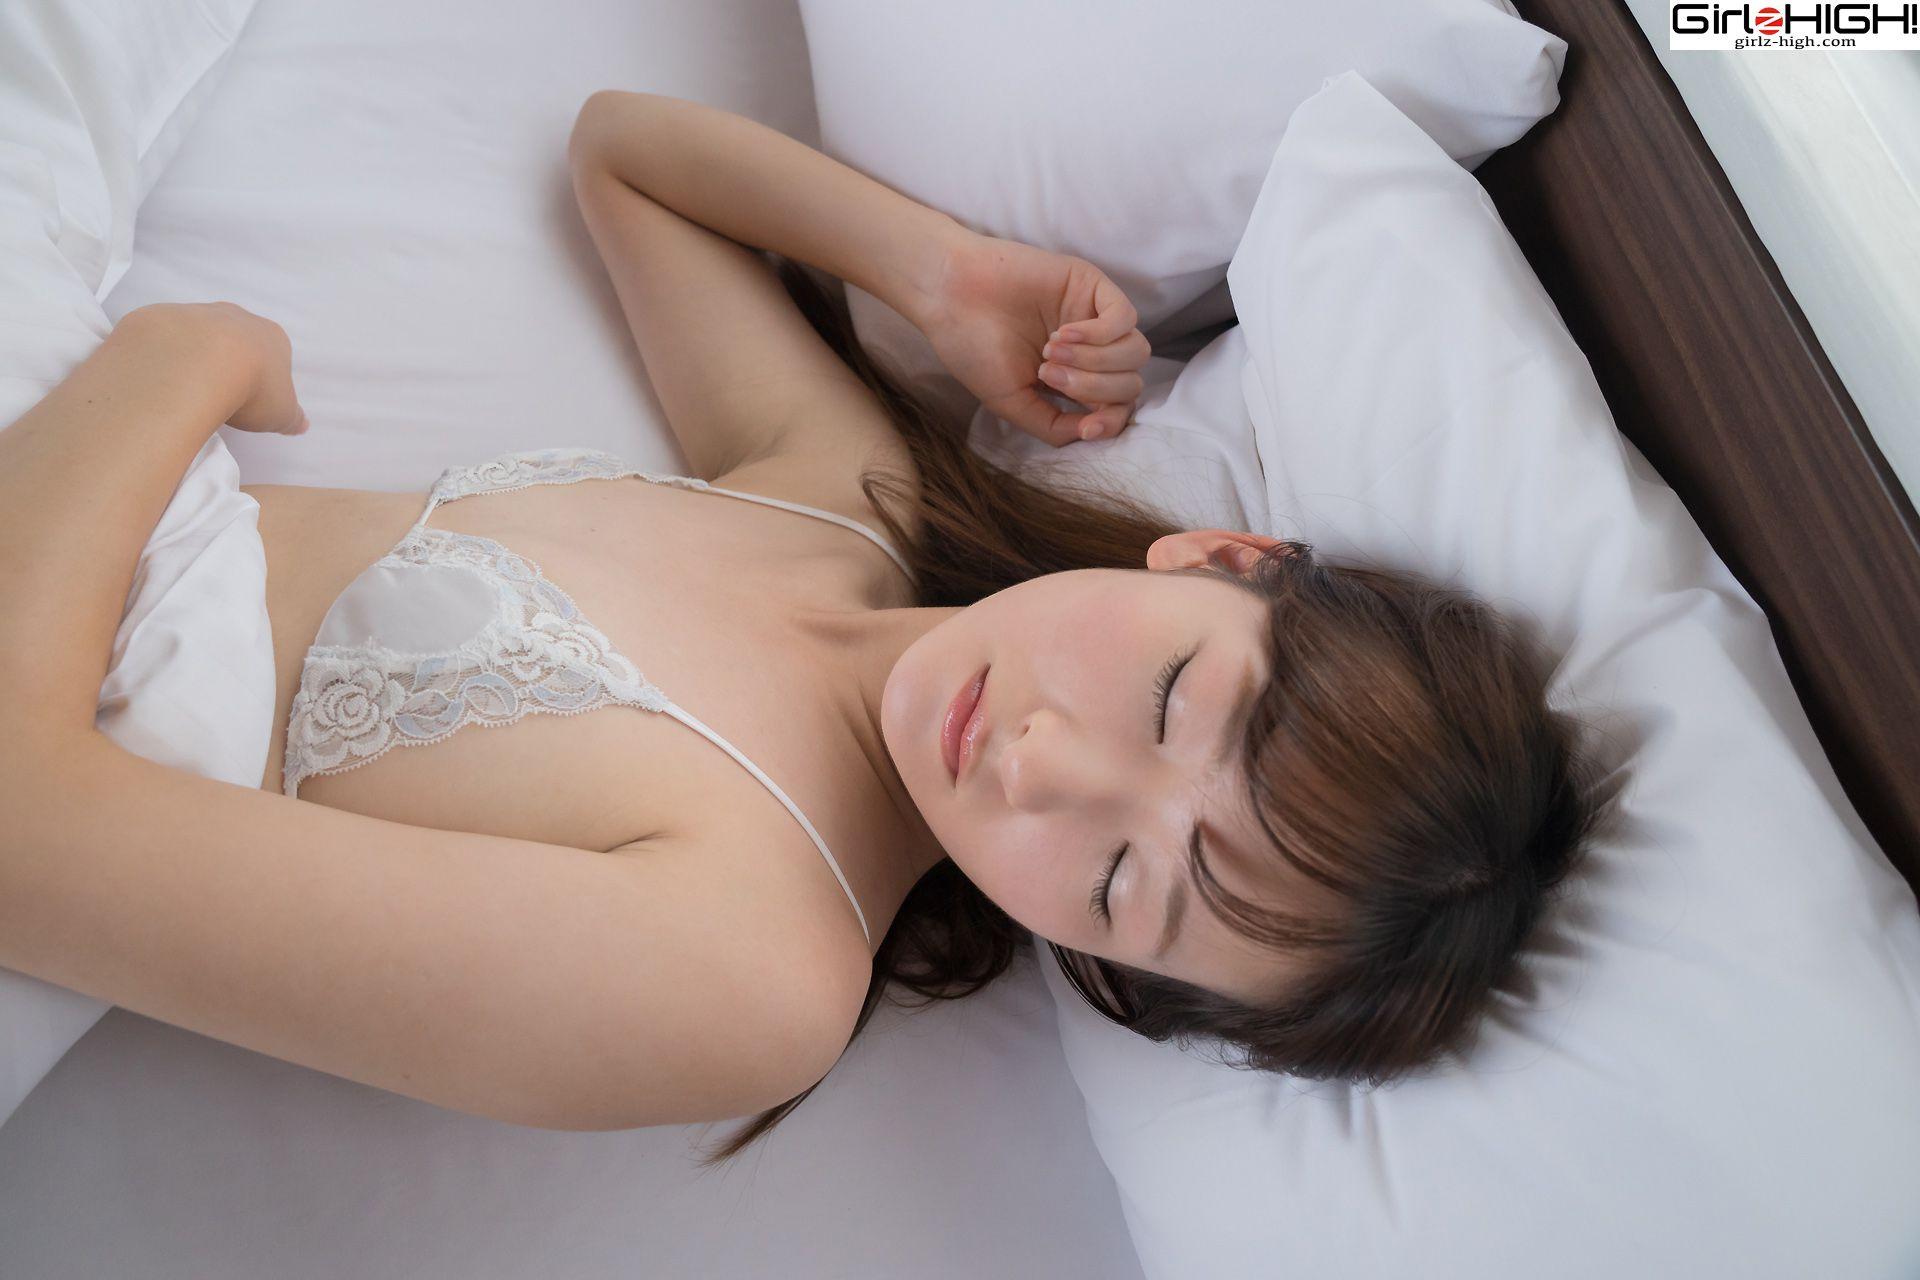 VOL.103 [Girlz-High]床上:近藤麻美(近藤あさみ)超高清写真套图(42P)